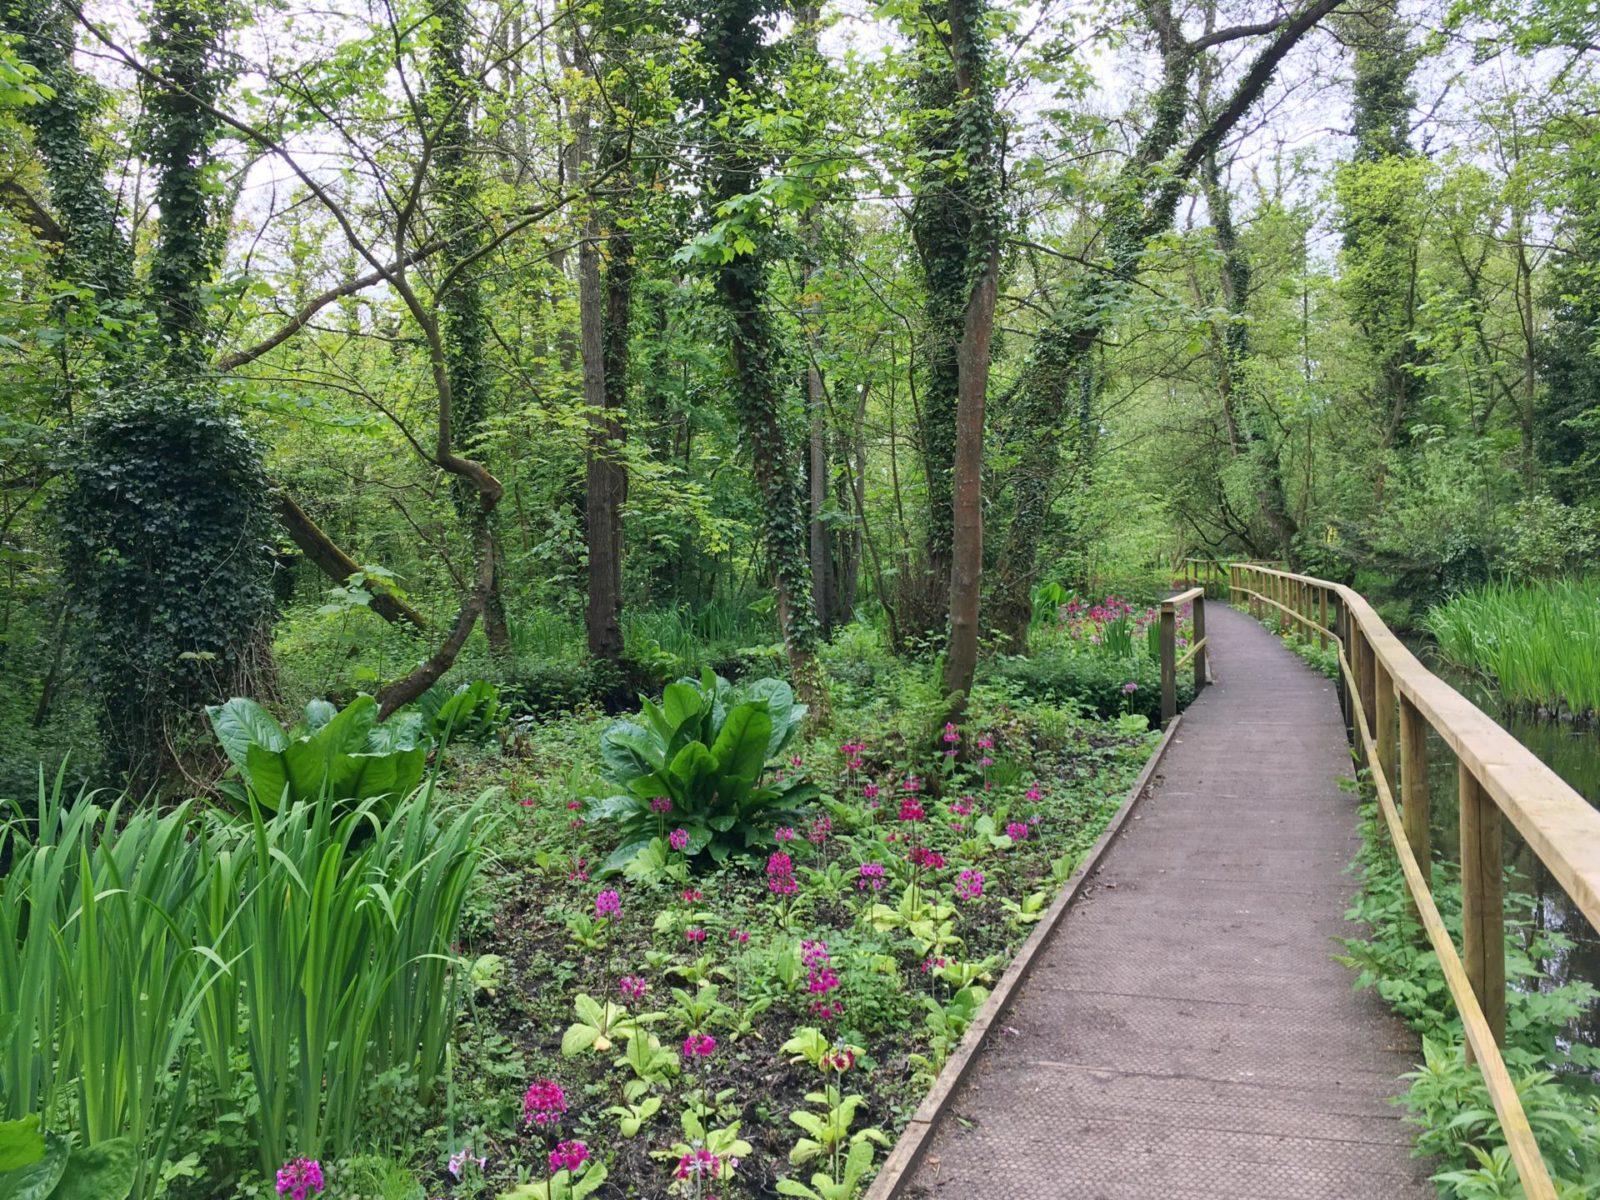 fairhaven water woodland garden nature reserves broads south walsham norfolk